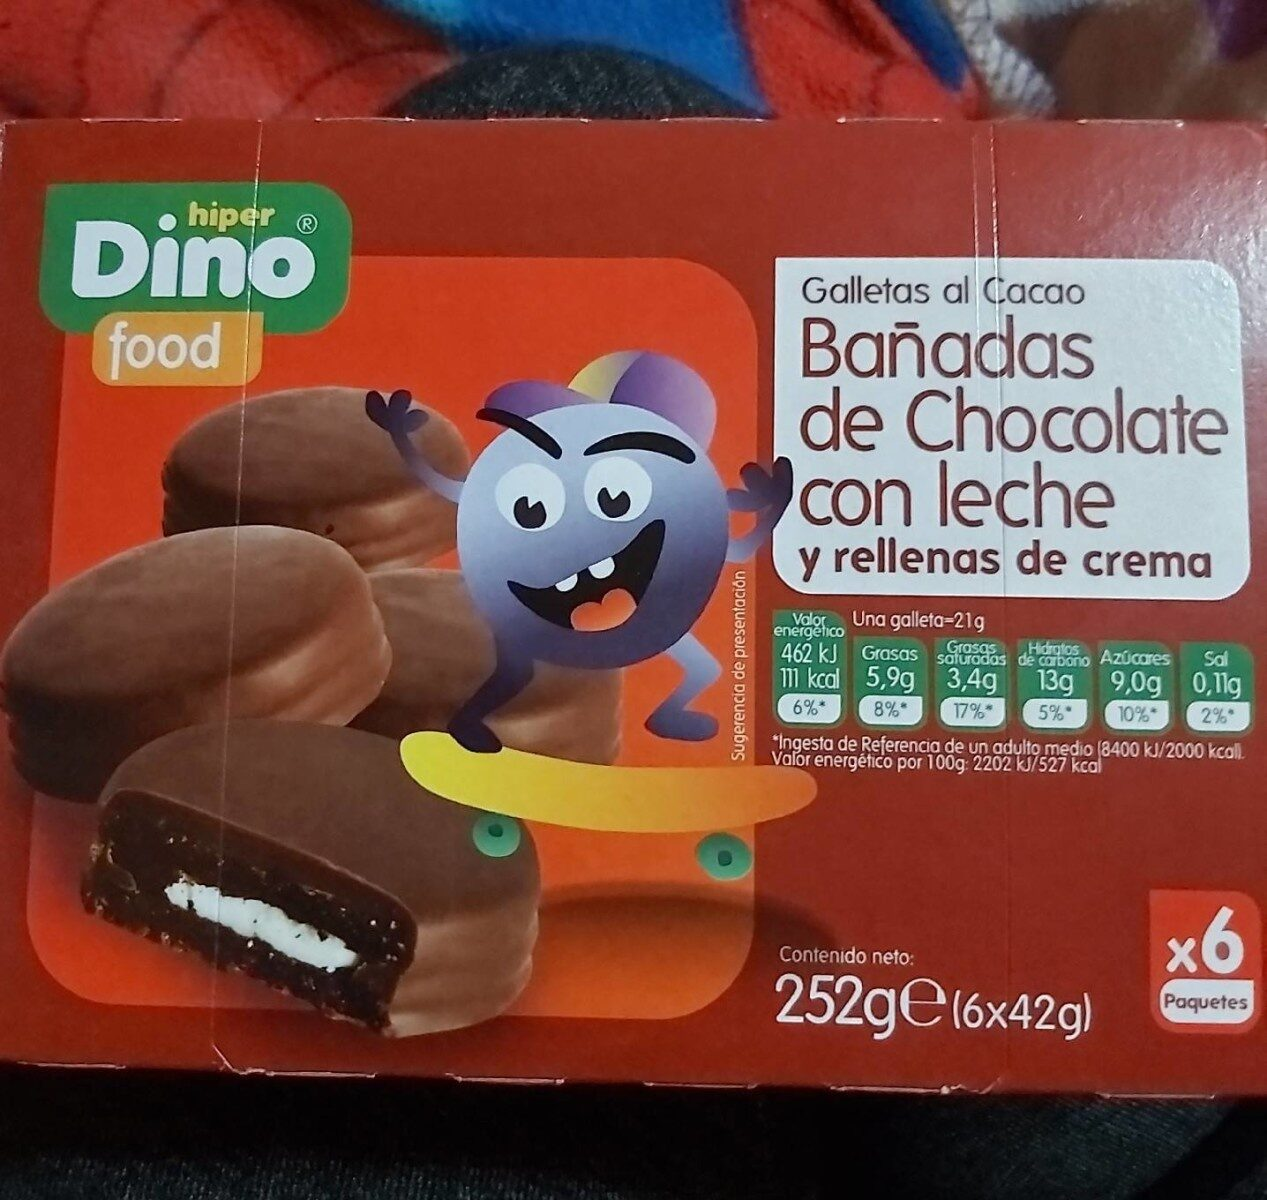 Galletas al cacao bañadas de chocolate con leche - Product